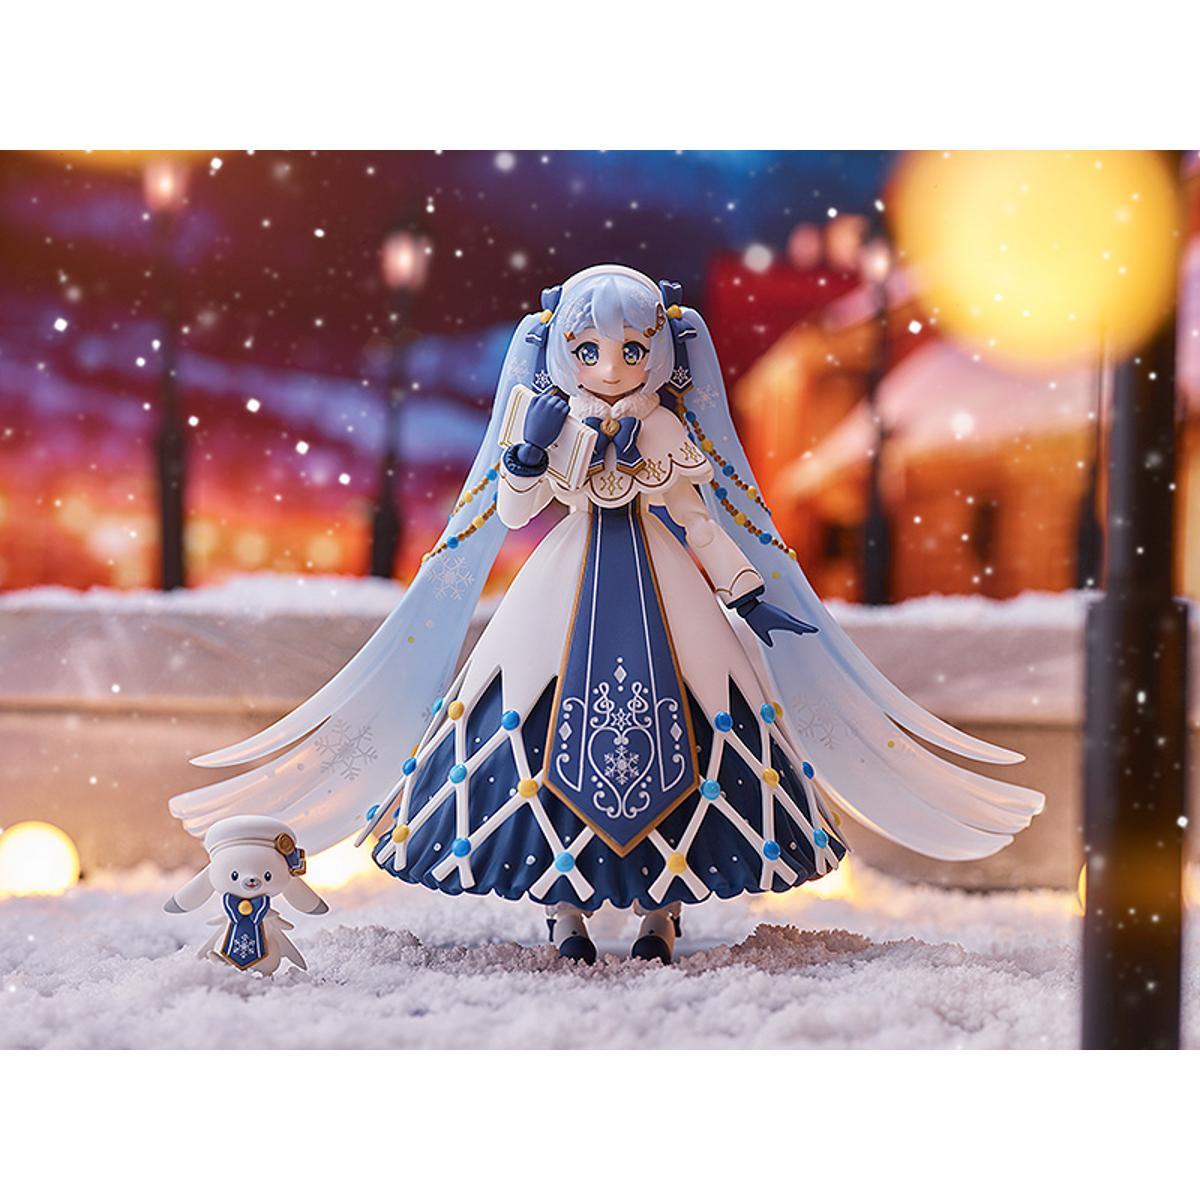 figma Snow Miku: Glowing Snow ver.